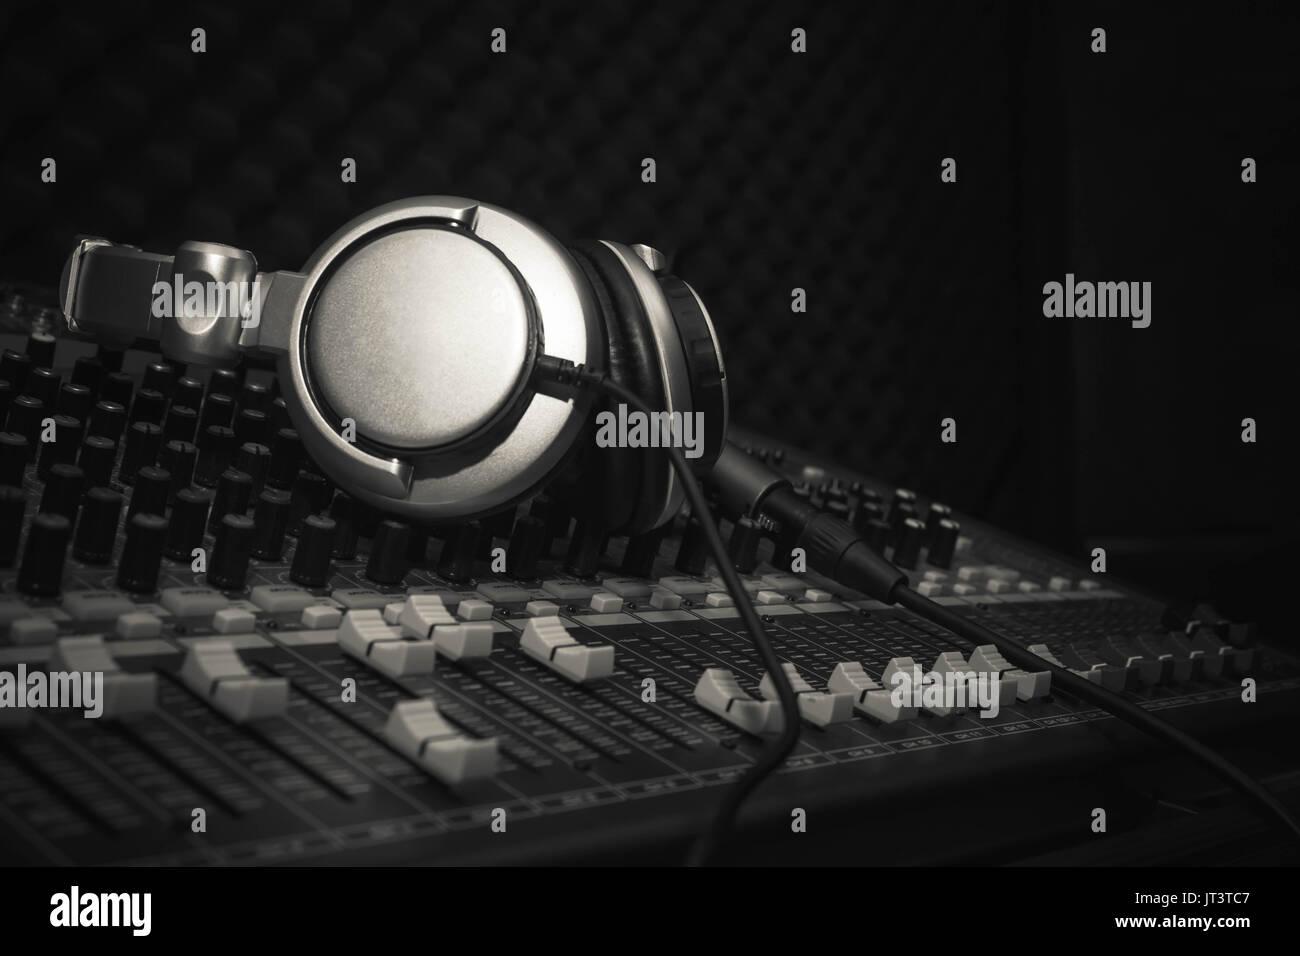 Disc_jockey Stockfotos & Disc_jockey Bilder - Seite 32 - Alamy